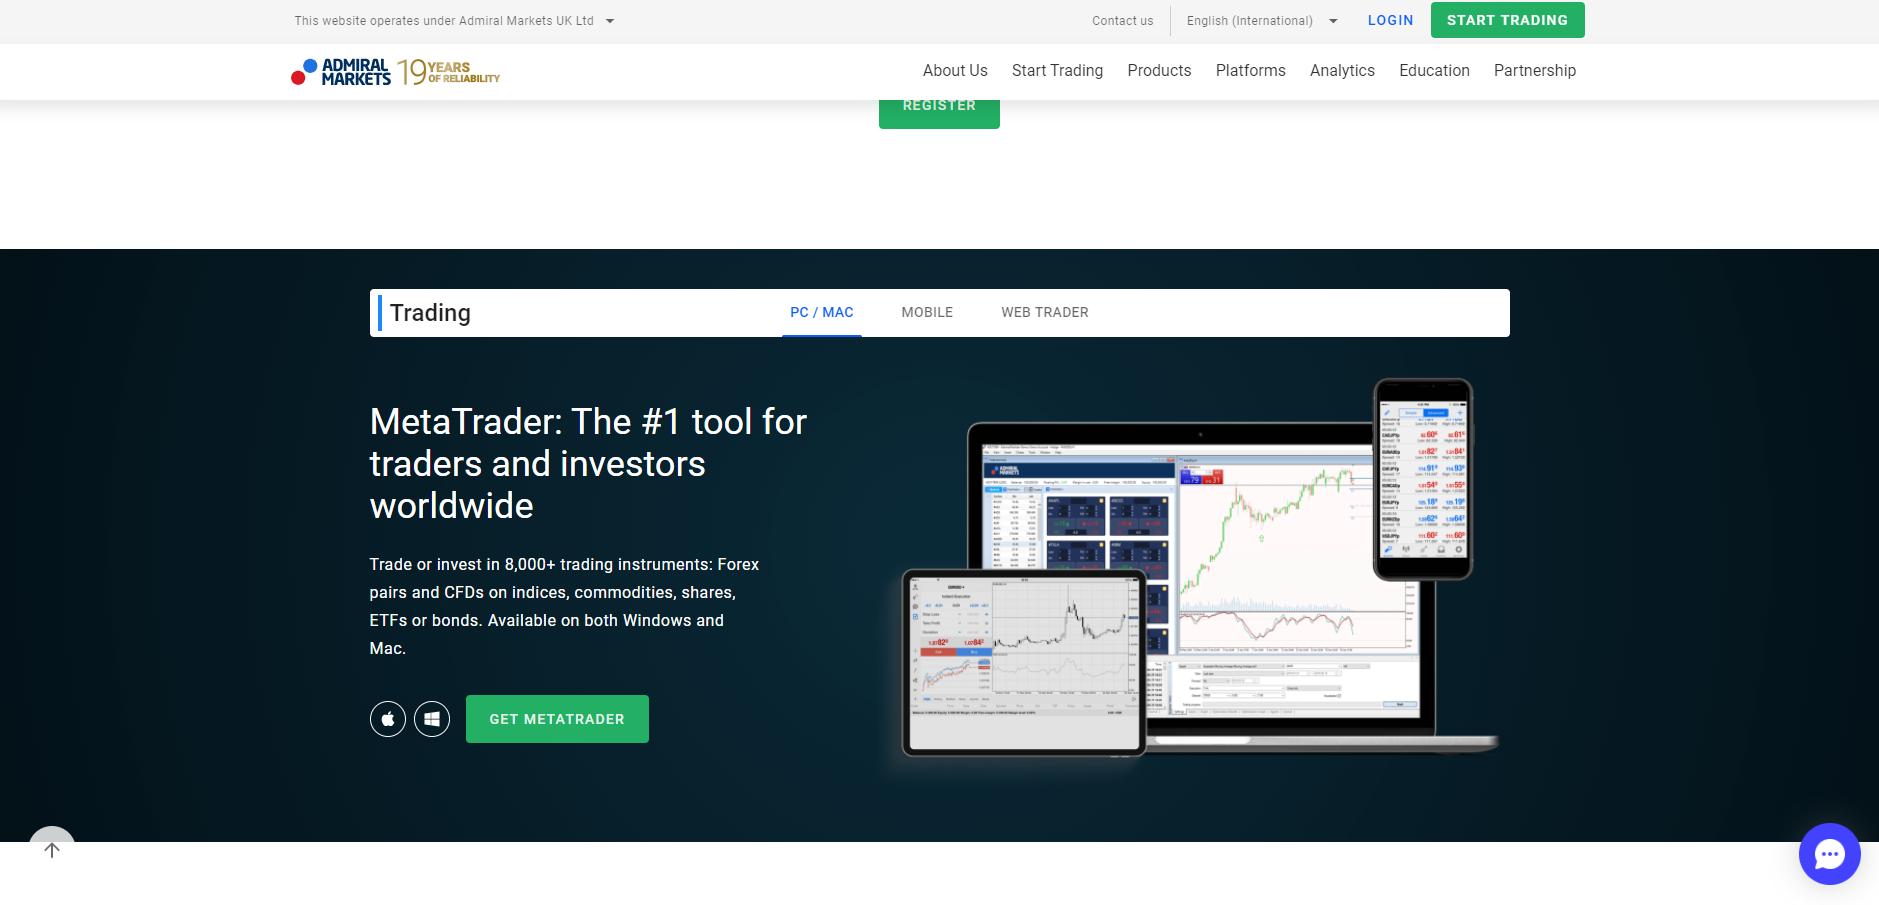 Oficjalna strona platformy forex Admiral Markets